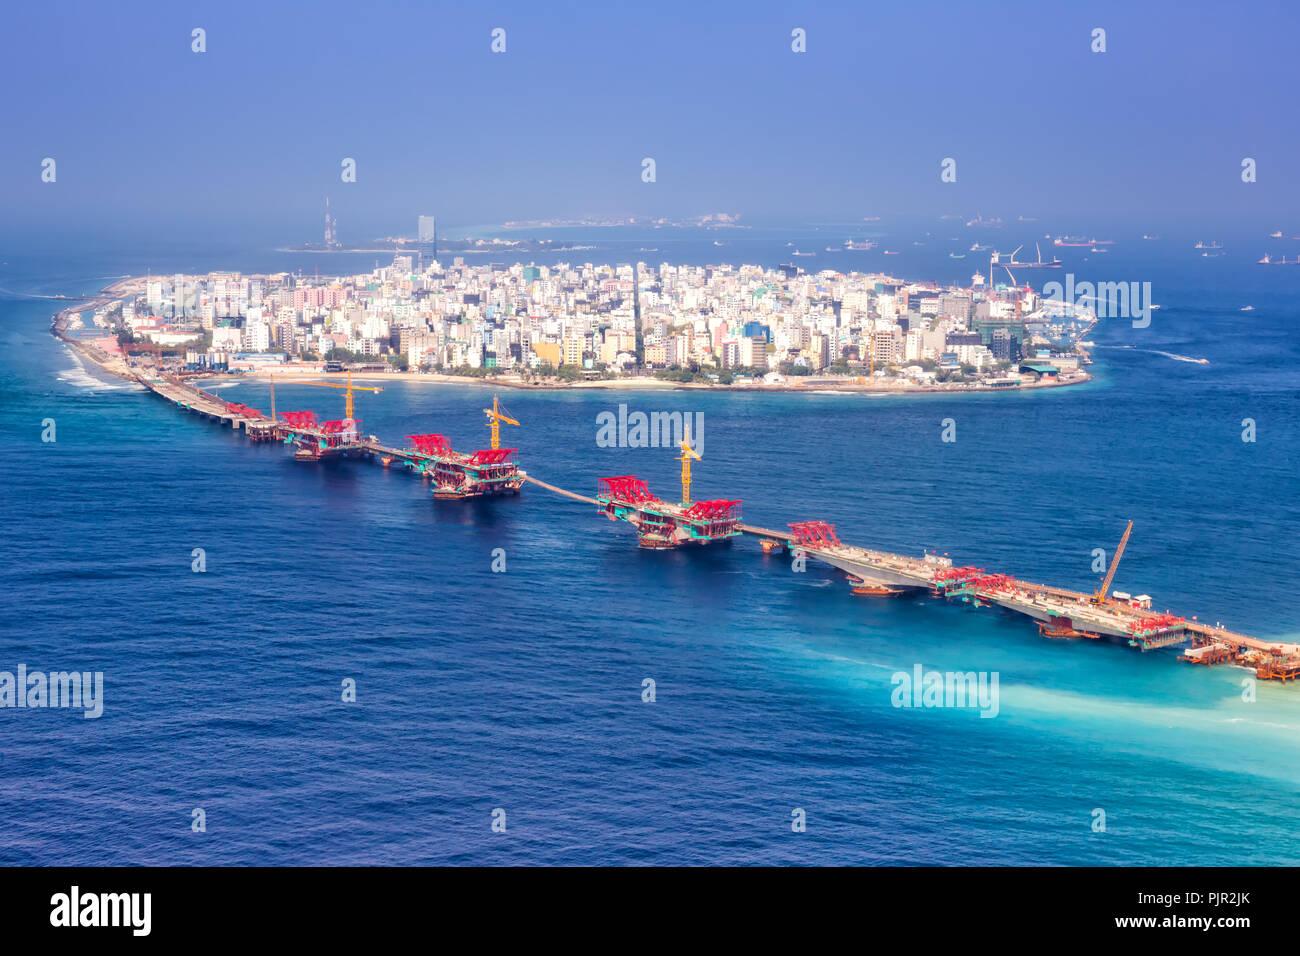 Maldives Male Capital City Island Ocean Bridge Aerial Photo